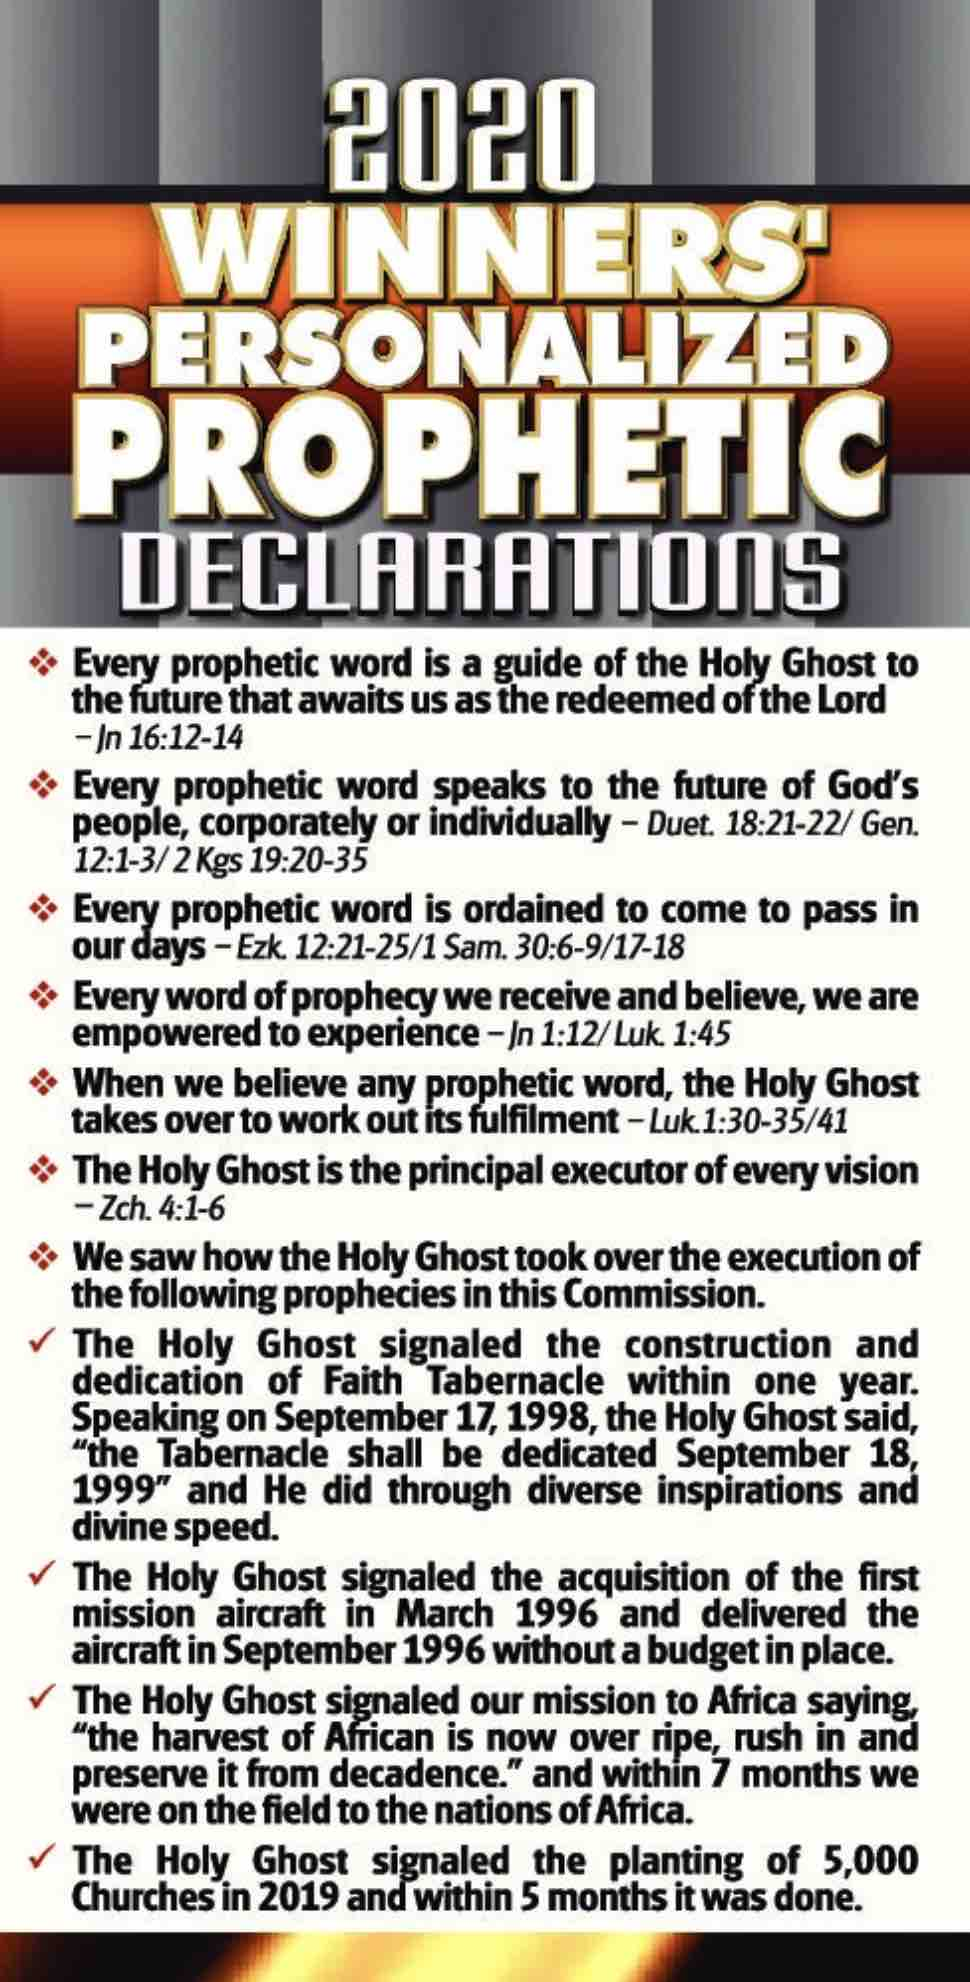 2020 Personalized Prophetic Declarations